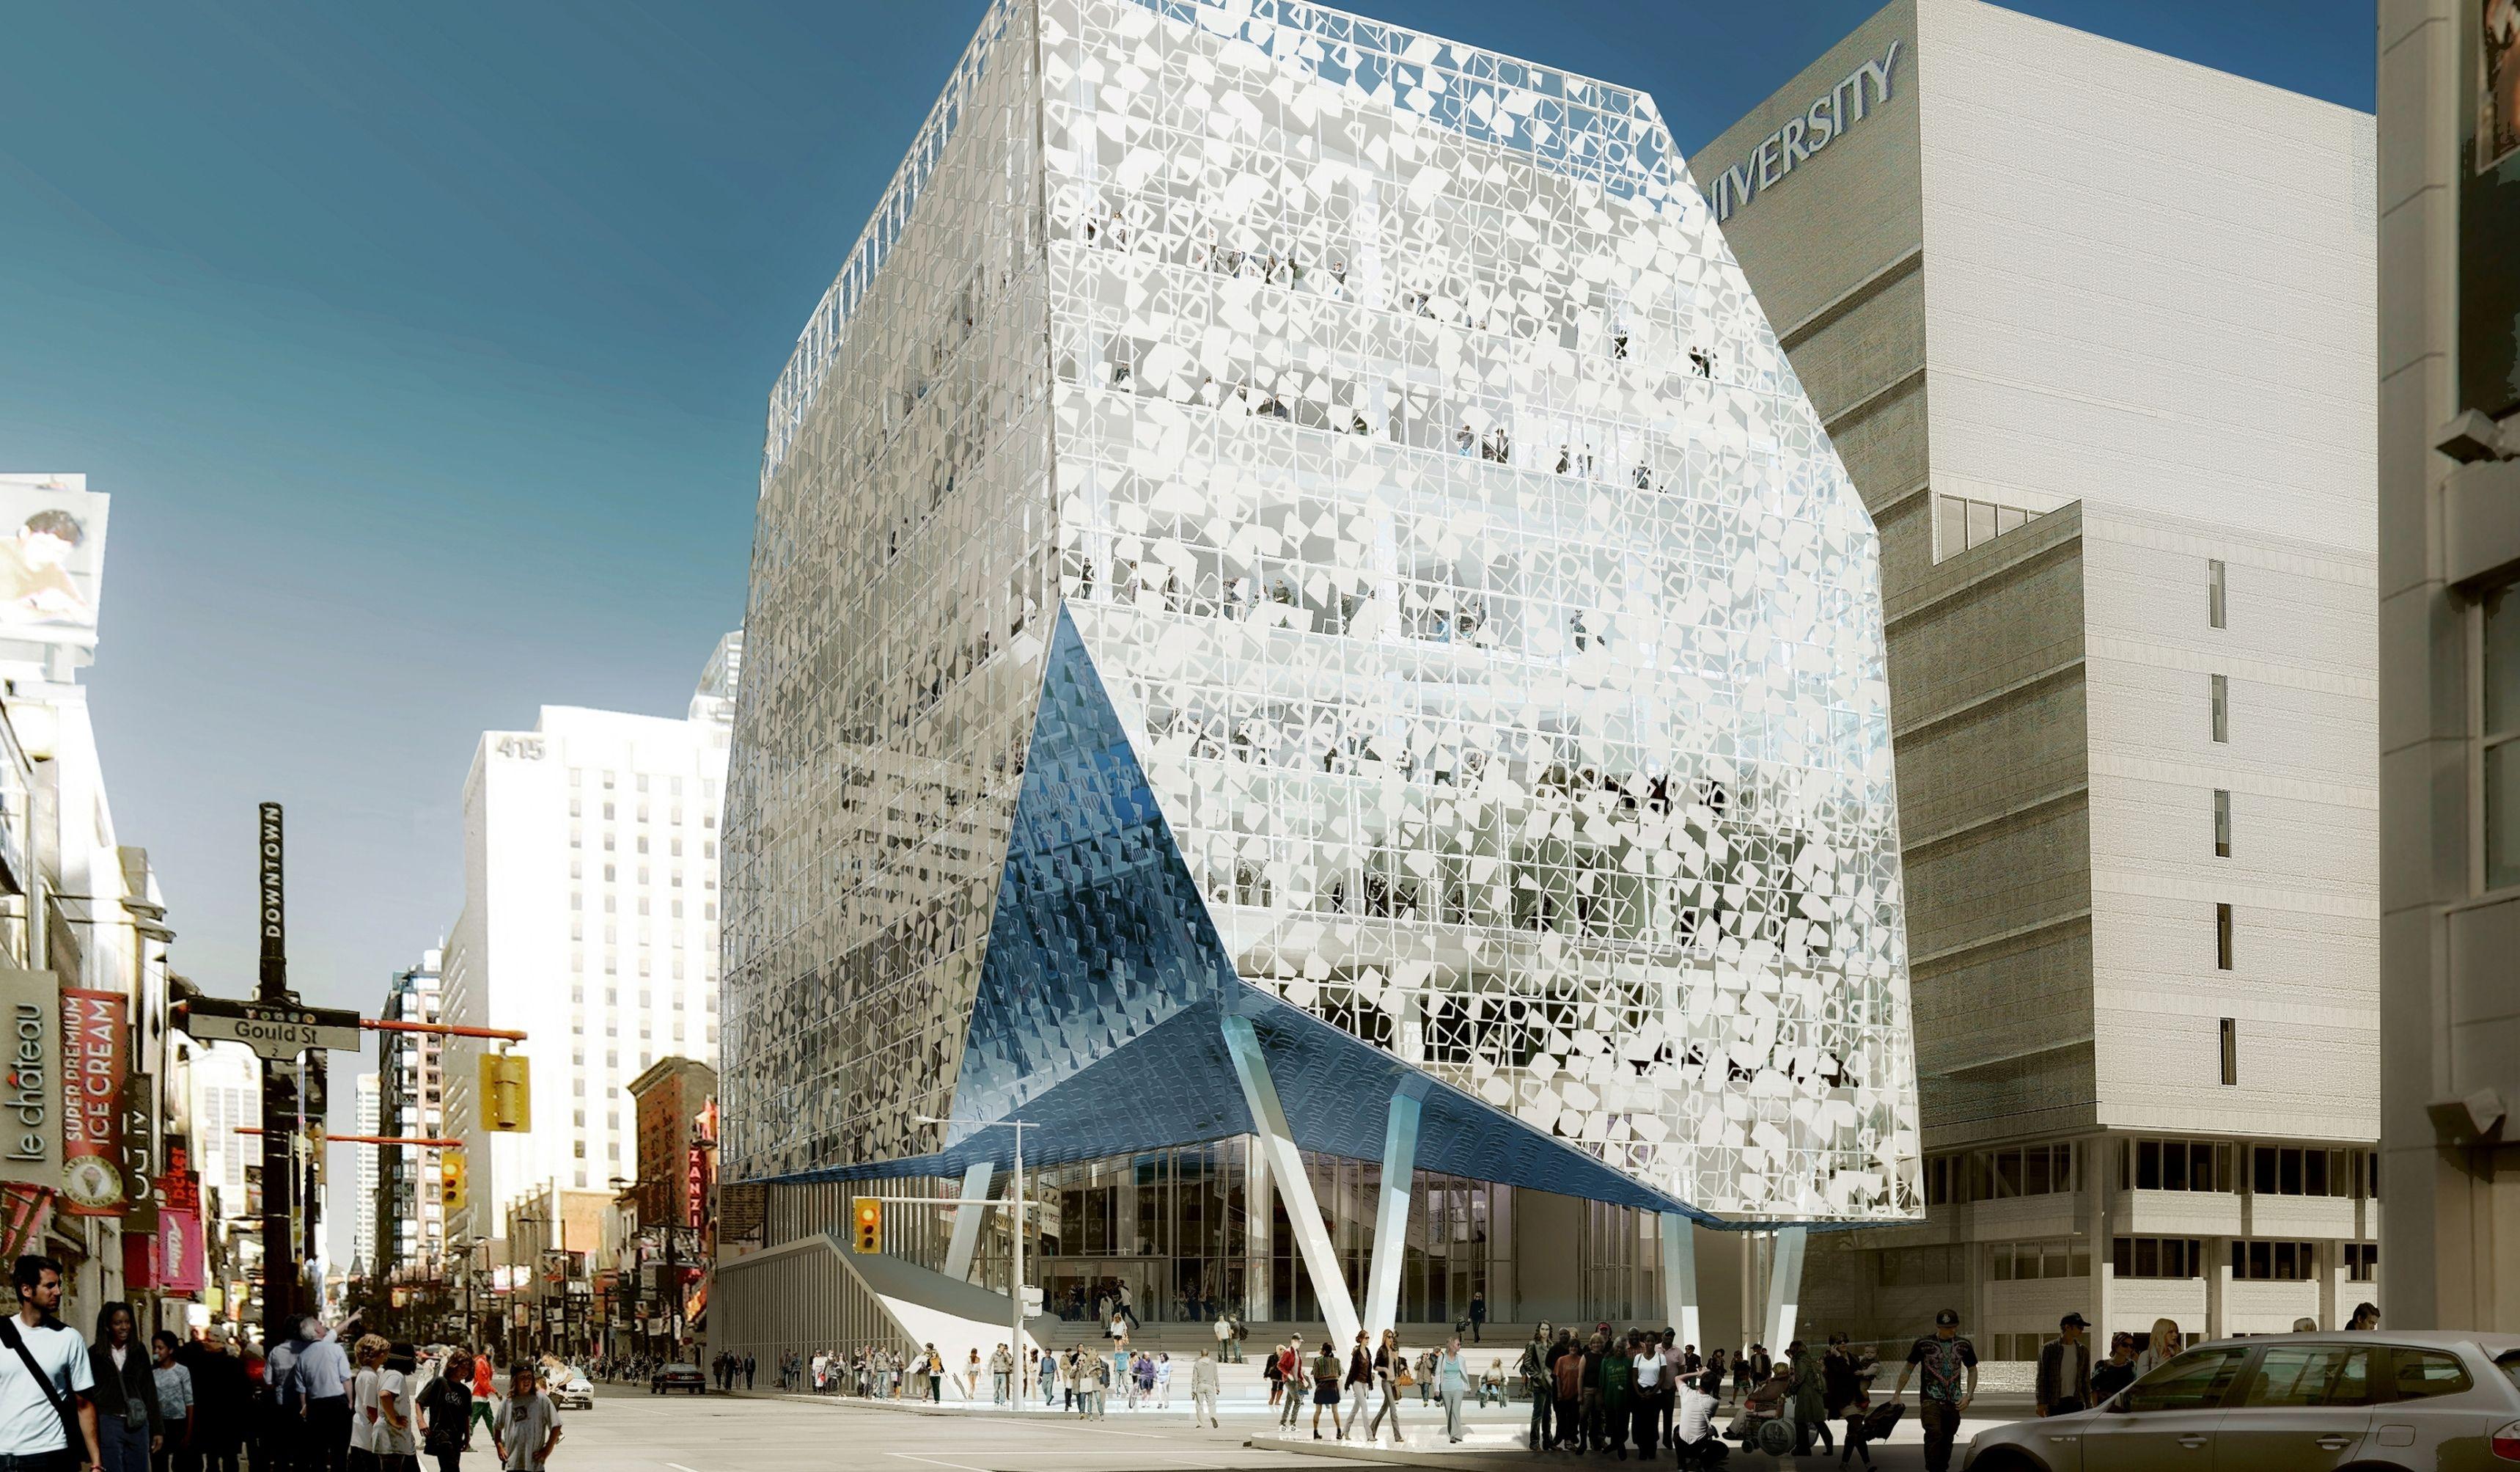 Ryerson University Library Education Architecture Architecture Building Architecture